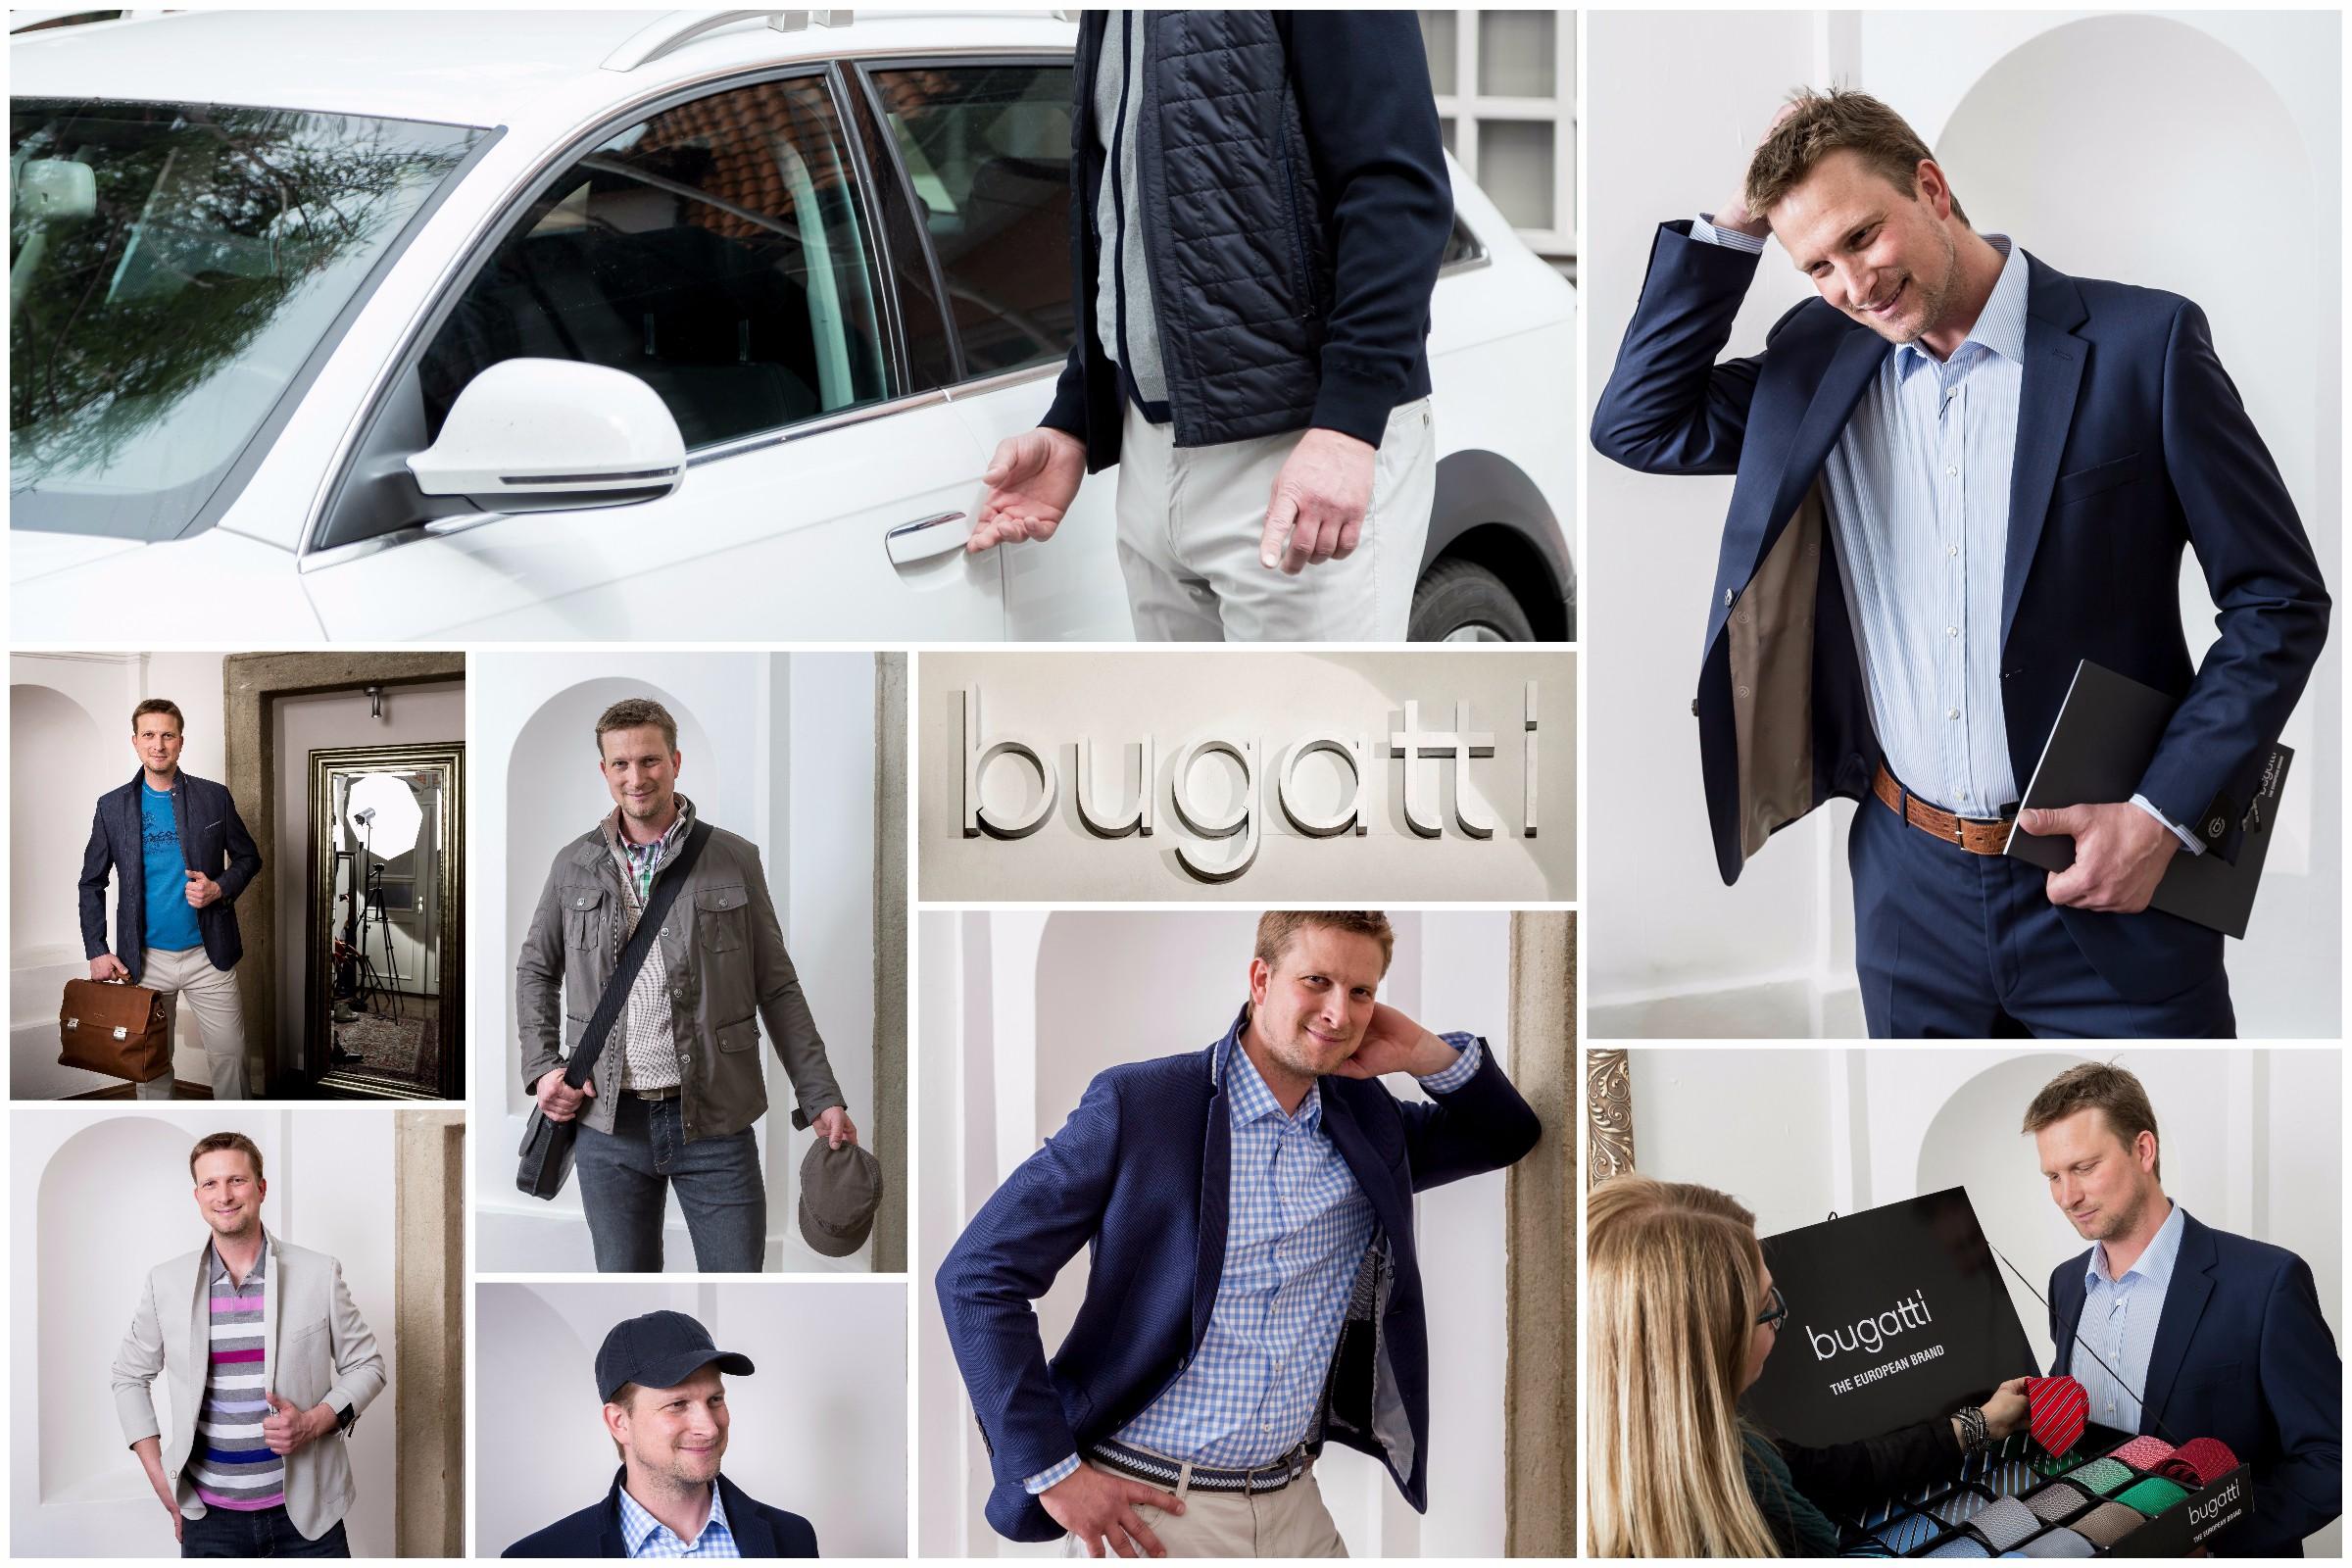 BeFunky Collage - BUGATTI